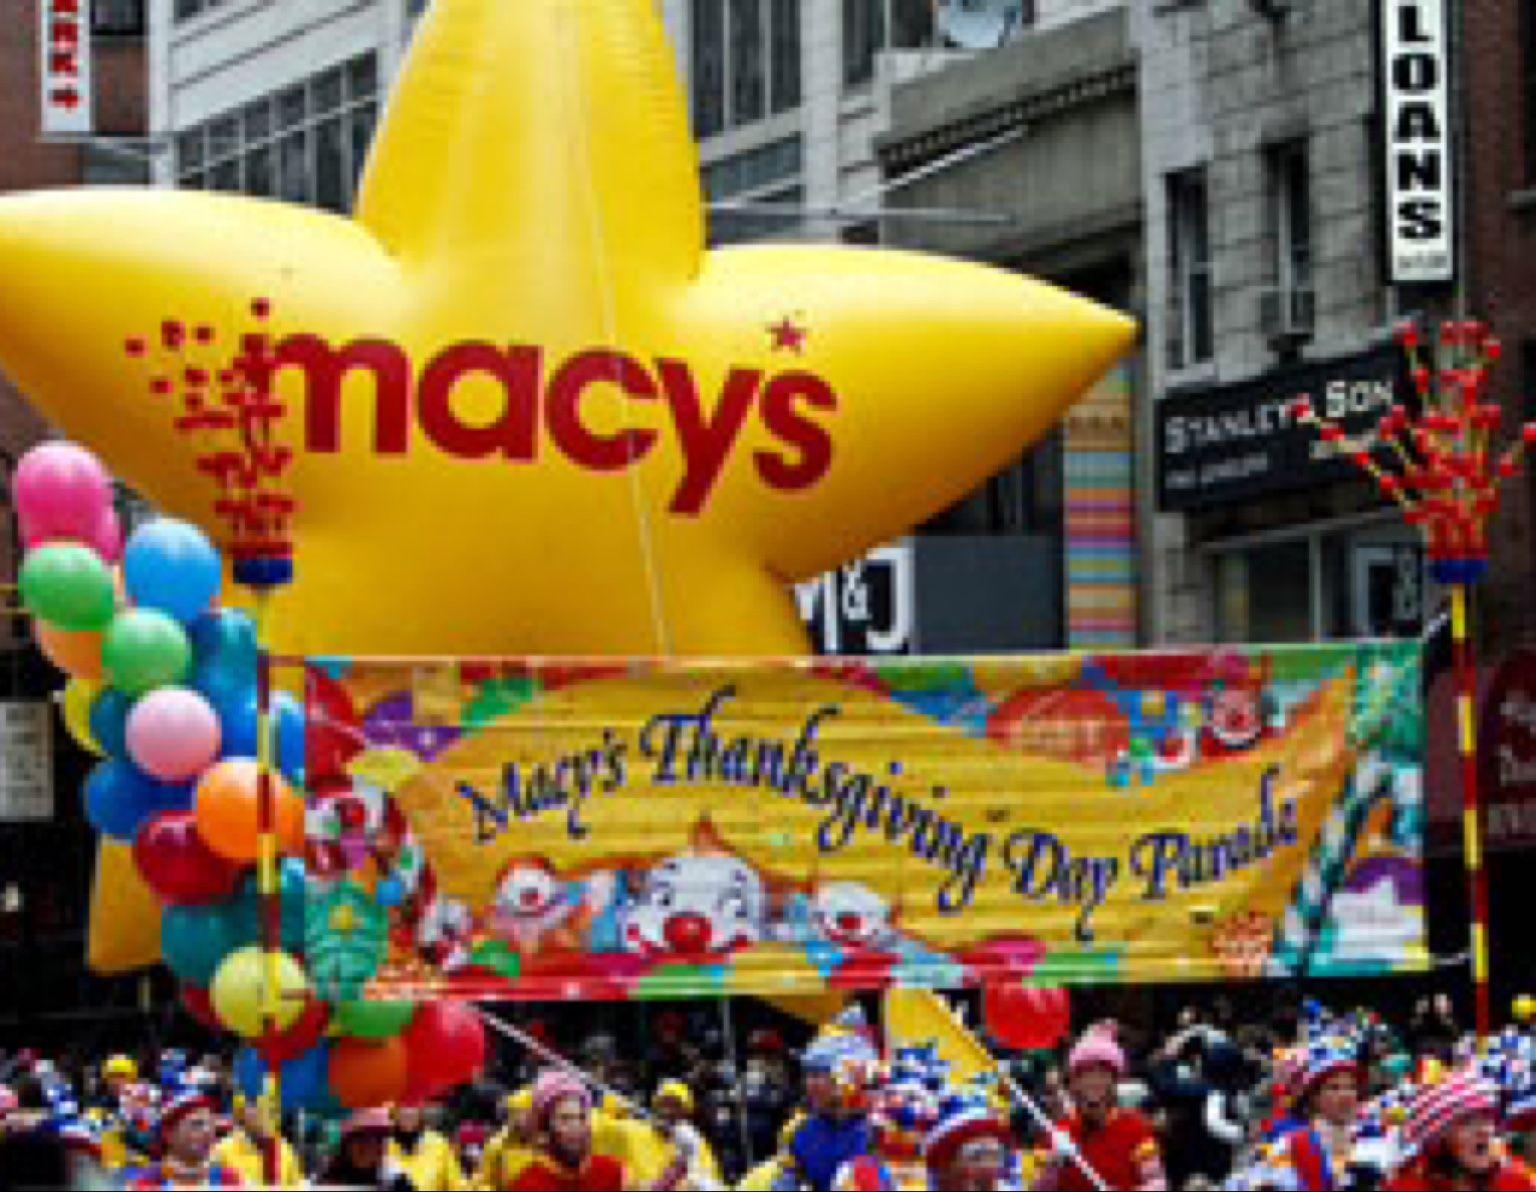 Macy S Thanksgiving Parade Thanksgiving Parade Macys Thanksgiving Parade Macy S Thanksgiving Day Parade